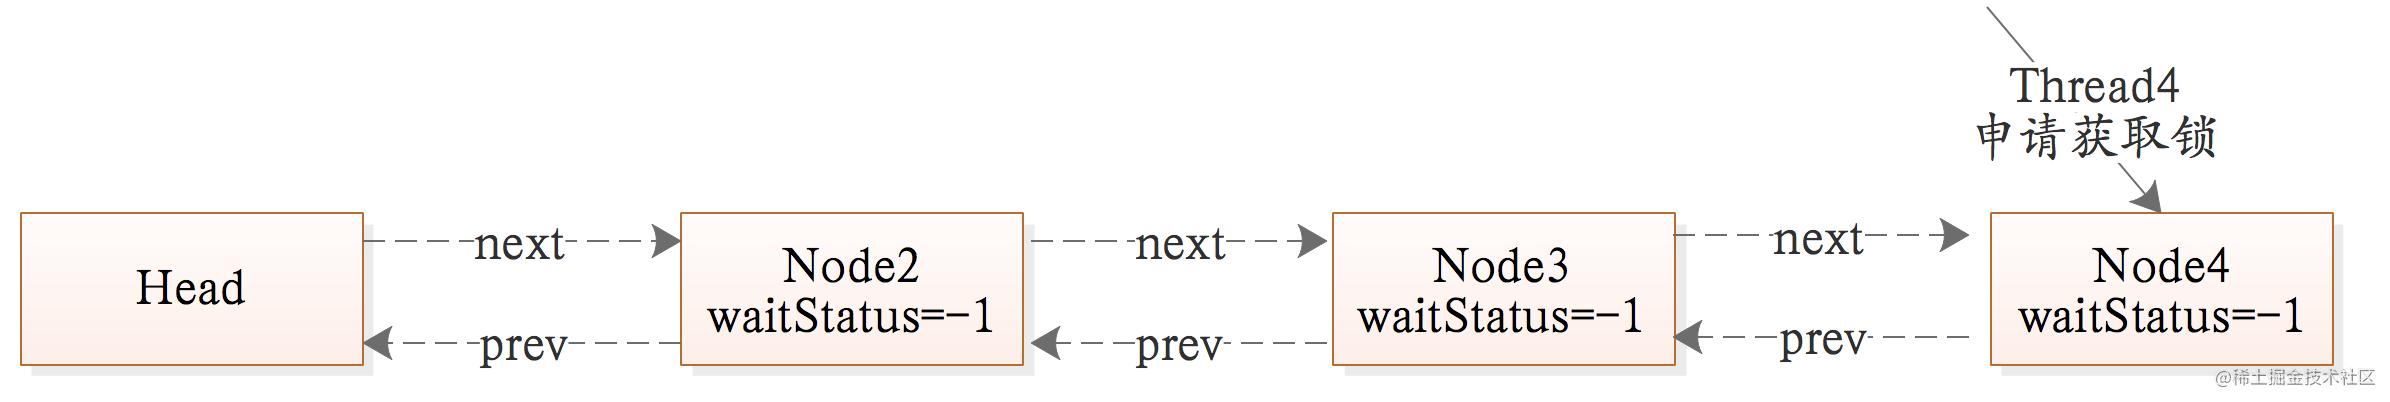 队列示例-process-4.png